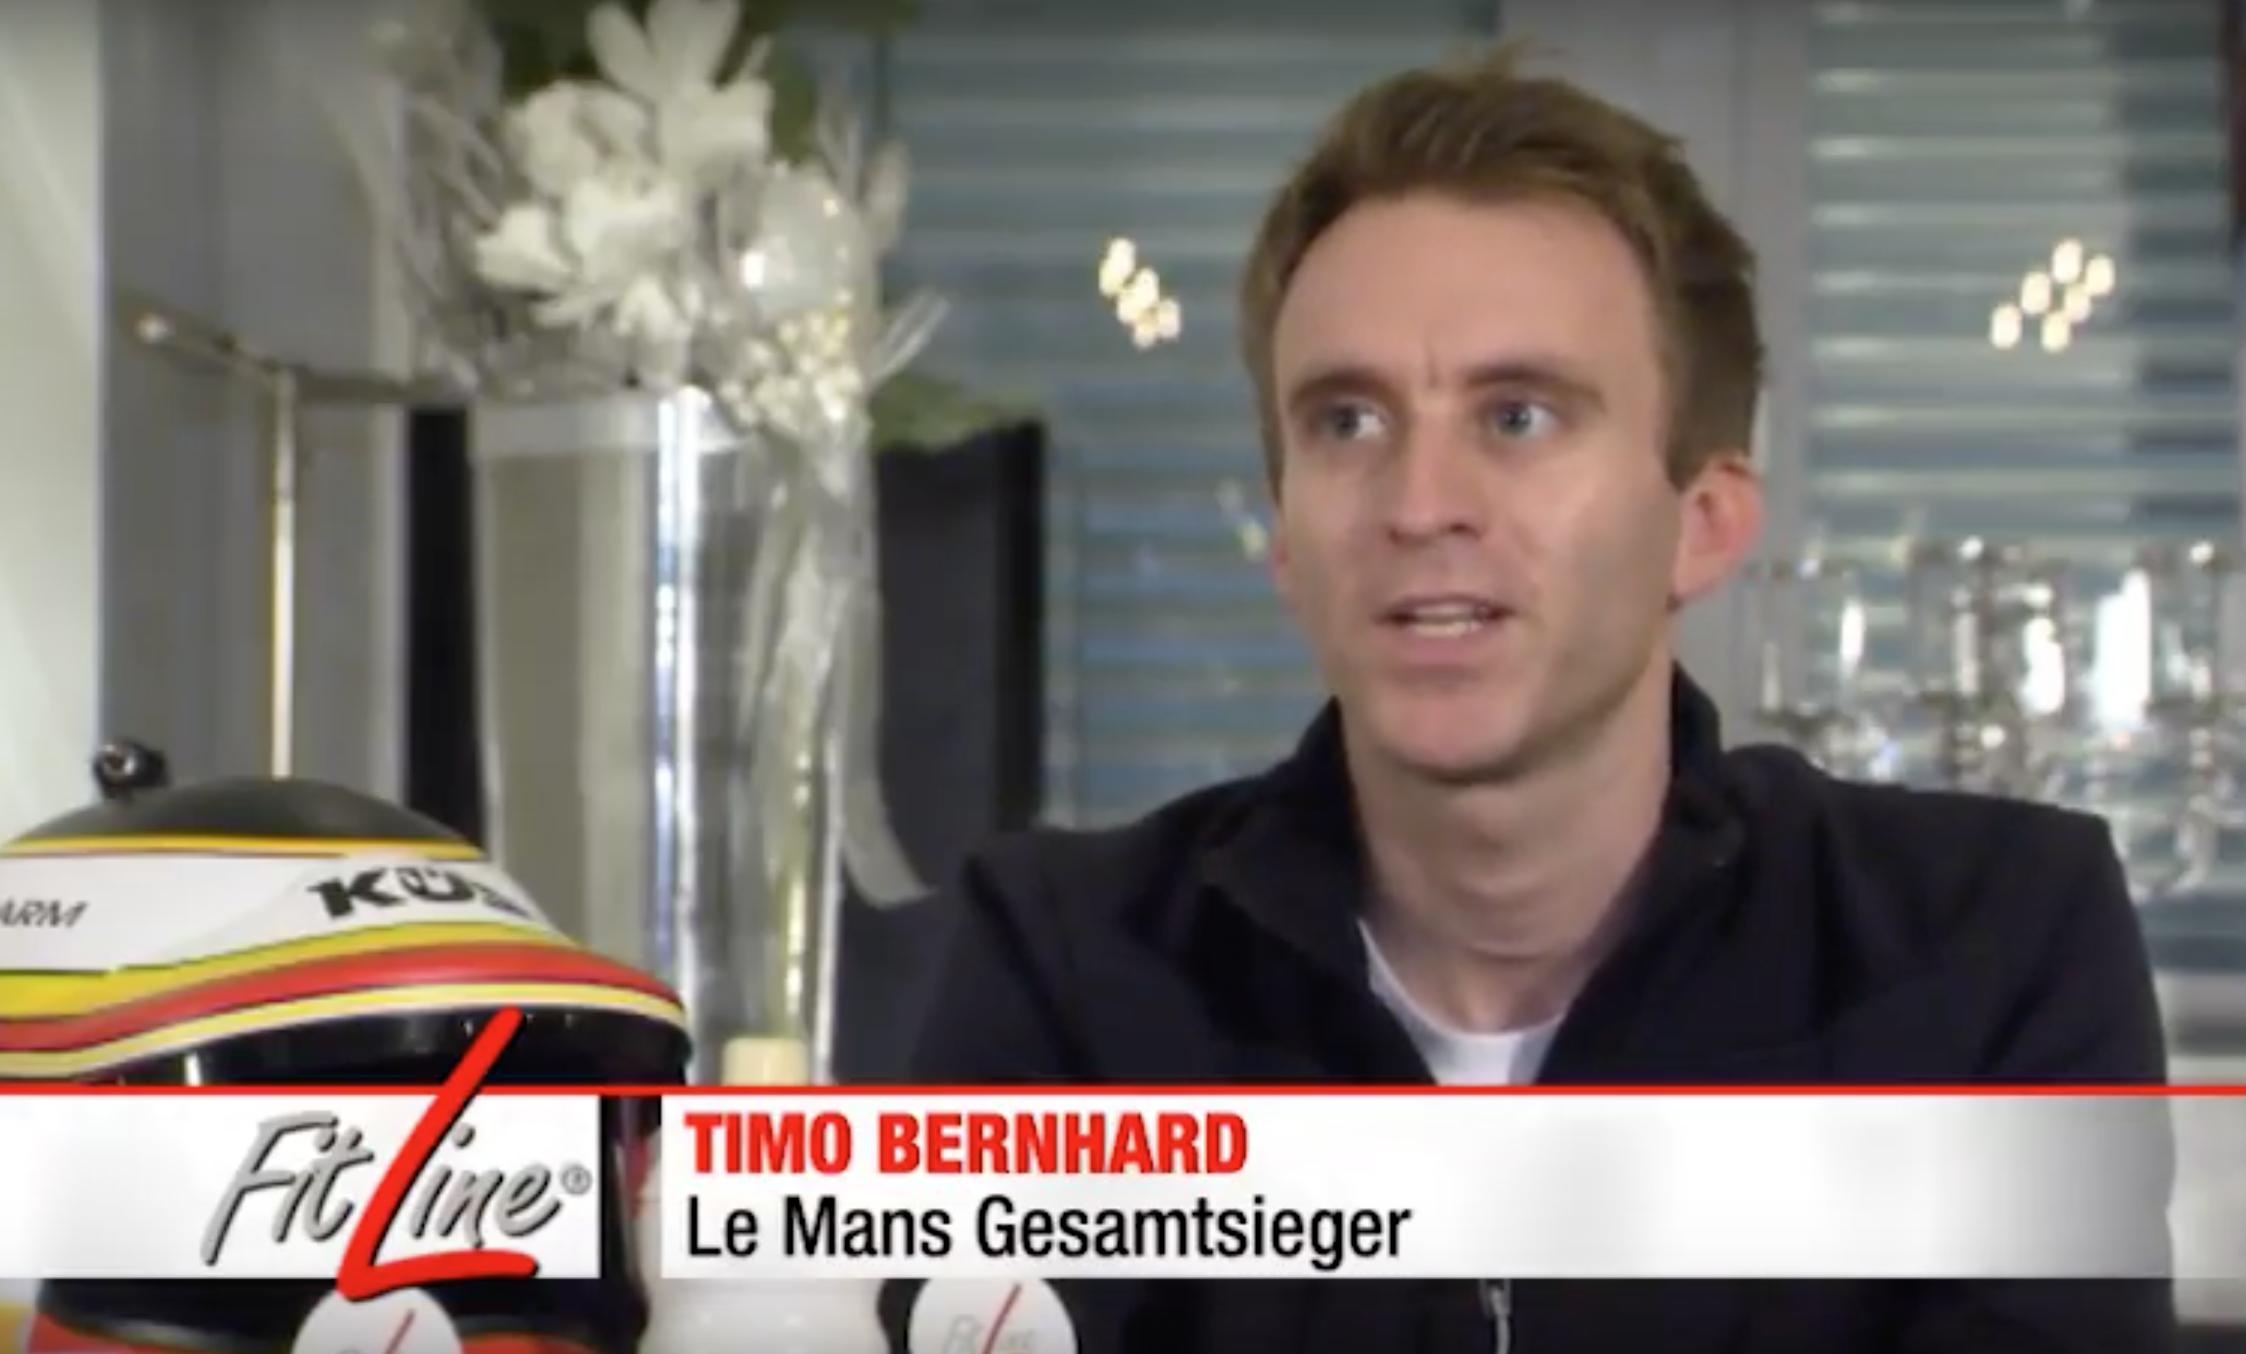 Timo Bernhard Le Mans Gesamtsieger